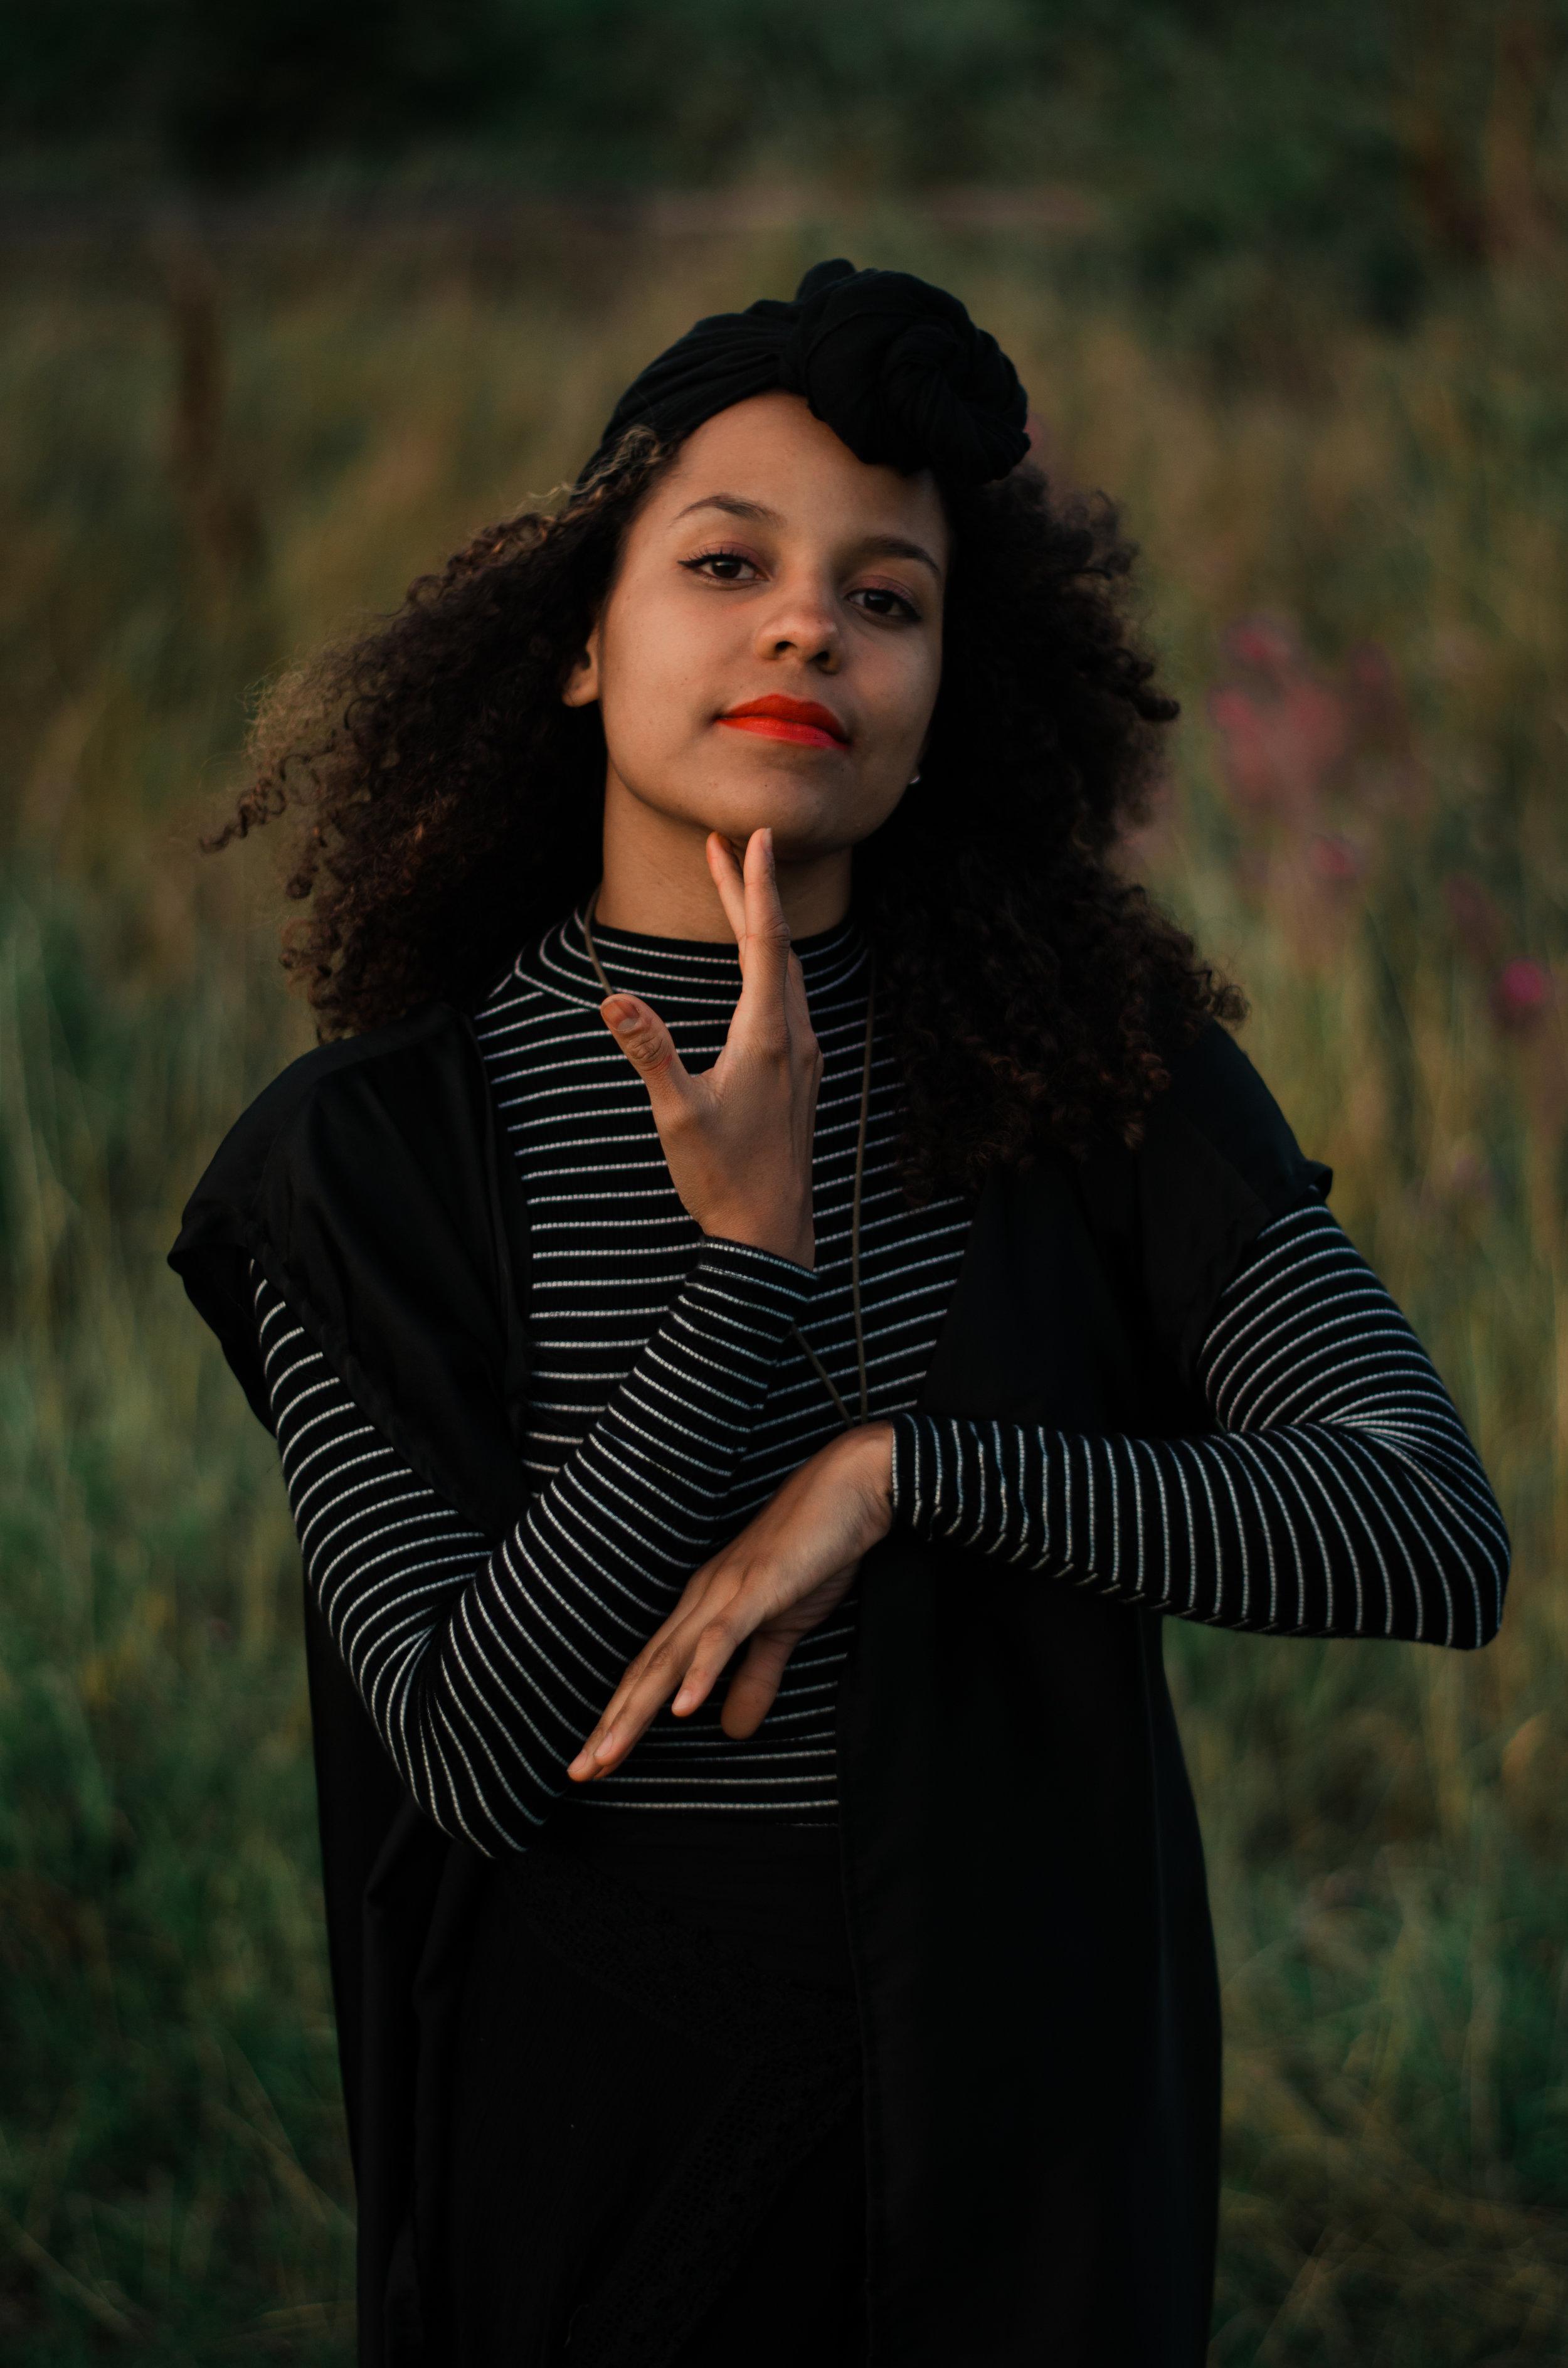 Inka-Portrait-Session-Aiste-Saulyte-Photography-17-07-30-544.jpg